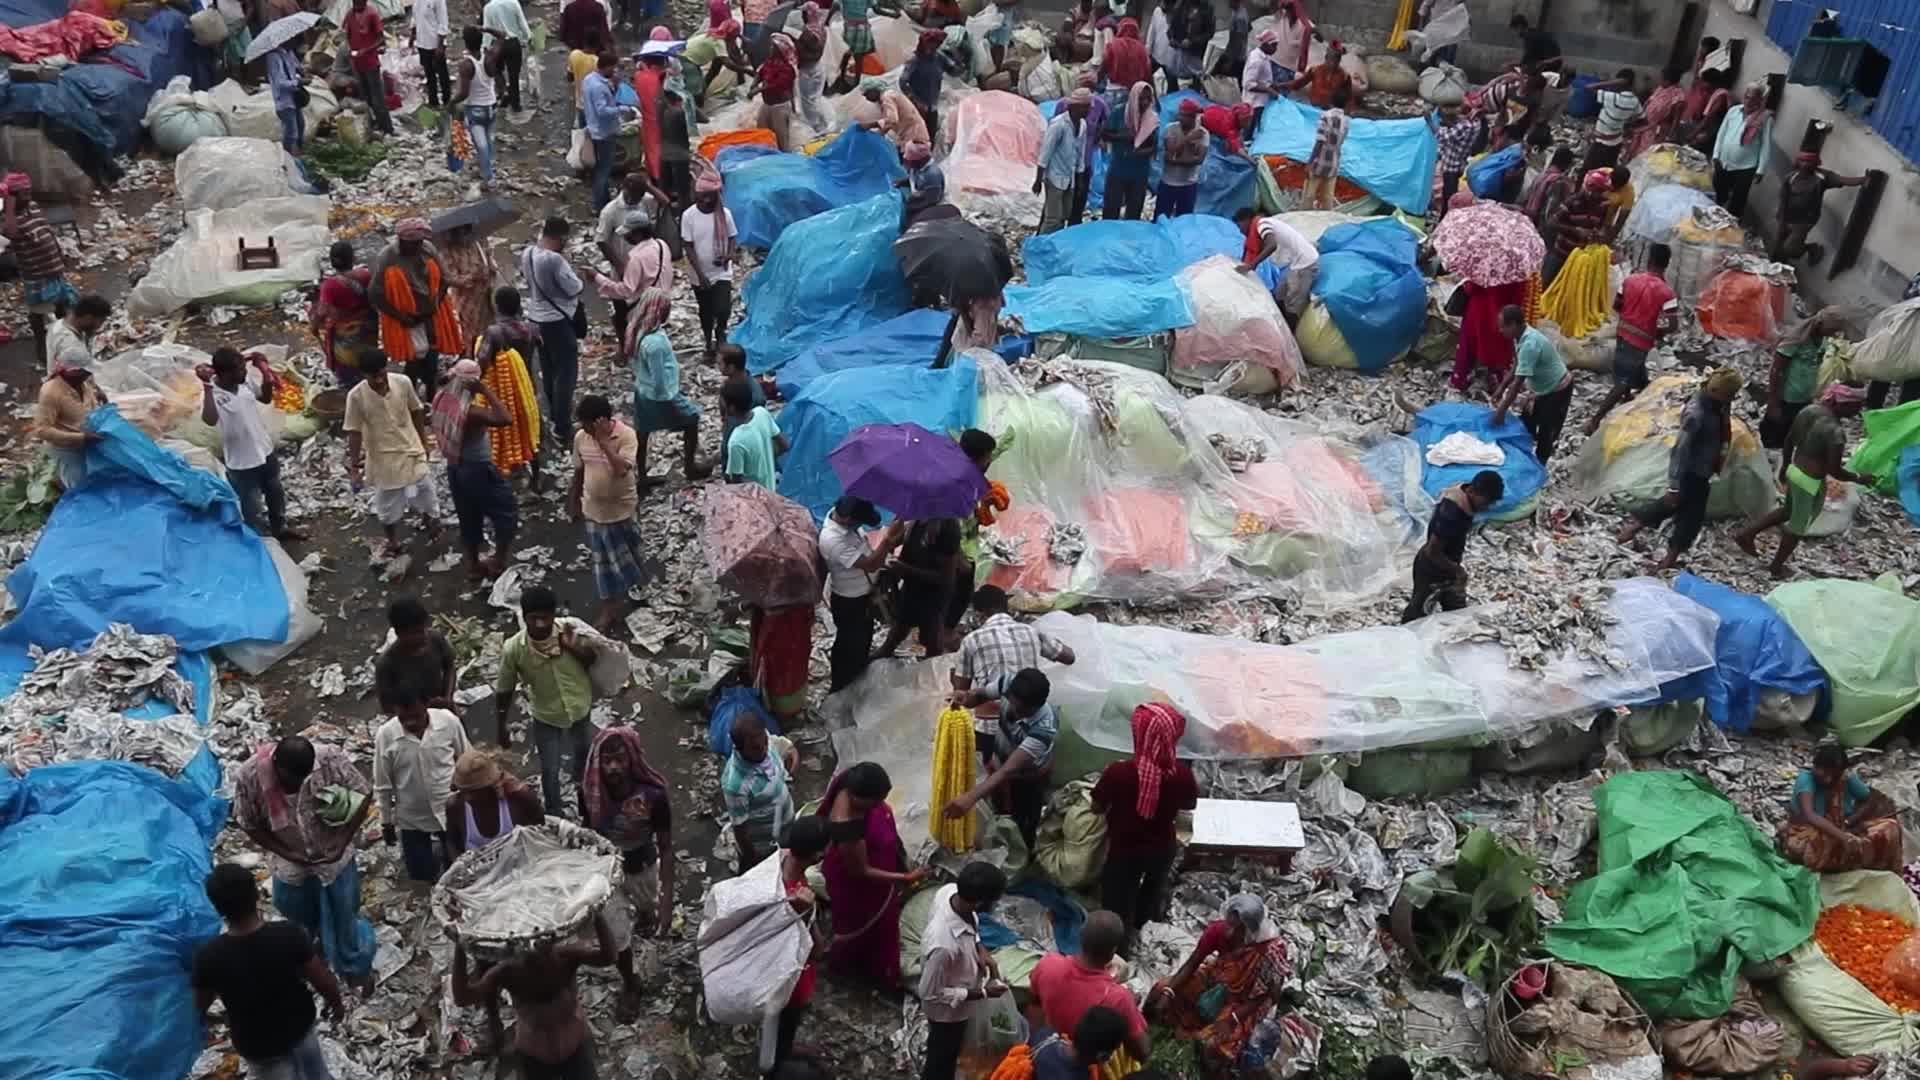 Flower market in Kolkata, India amid the Covid-19 pandemic